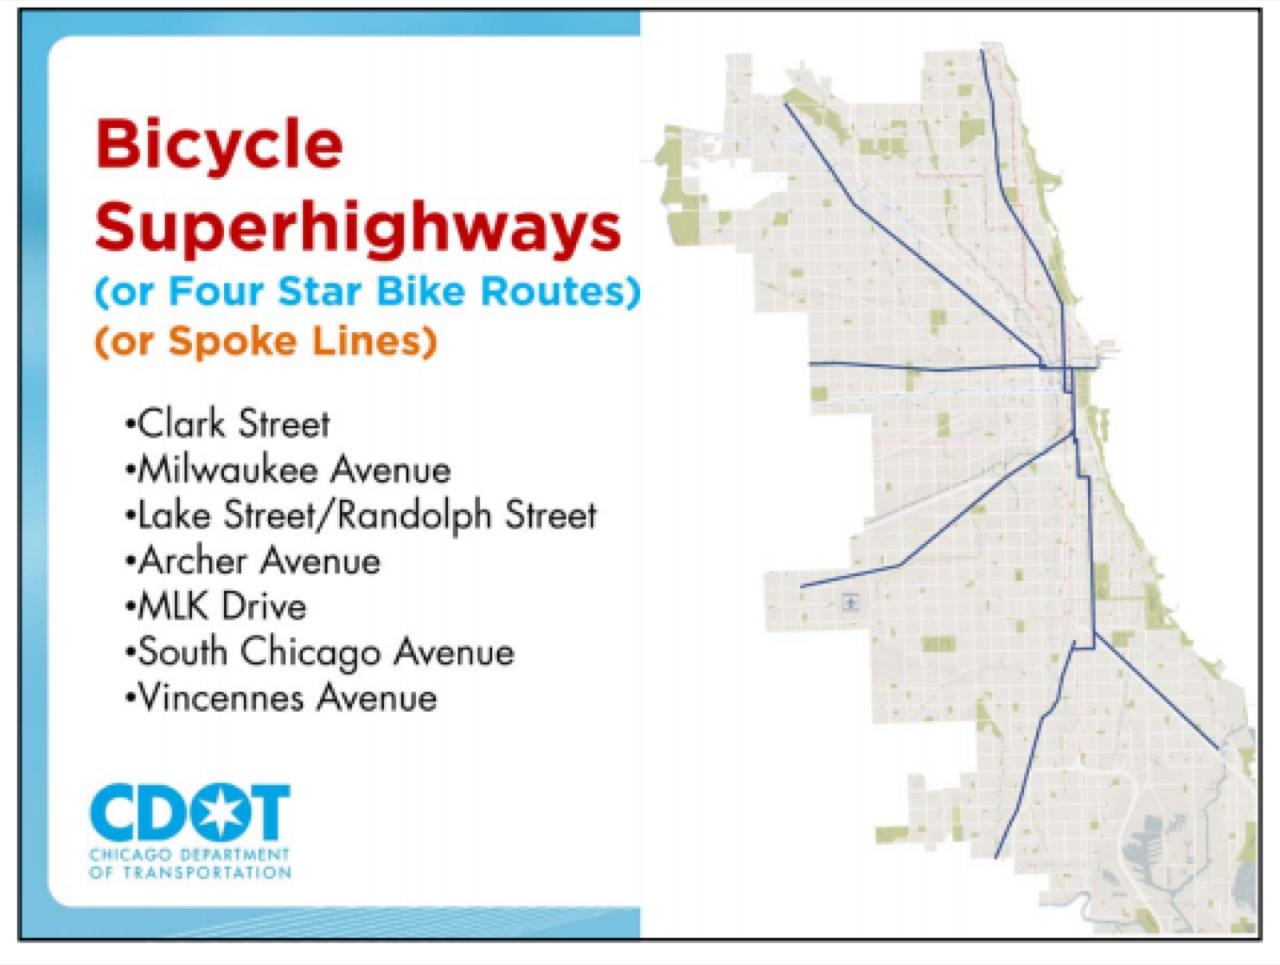 Bike Walk Lincoln Park: Chicago's proposed bike network